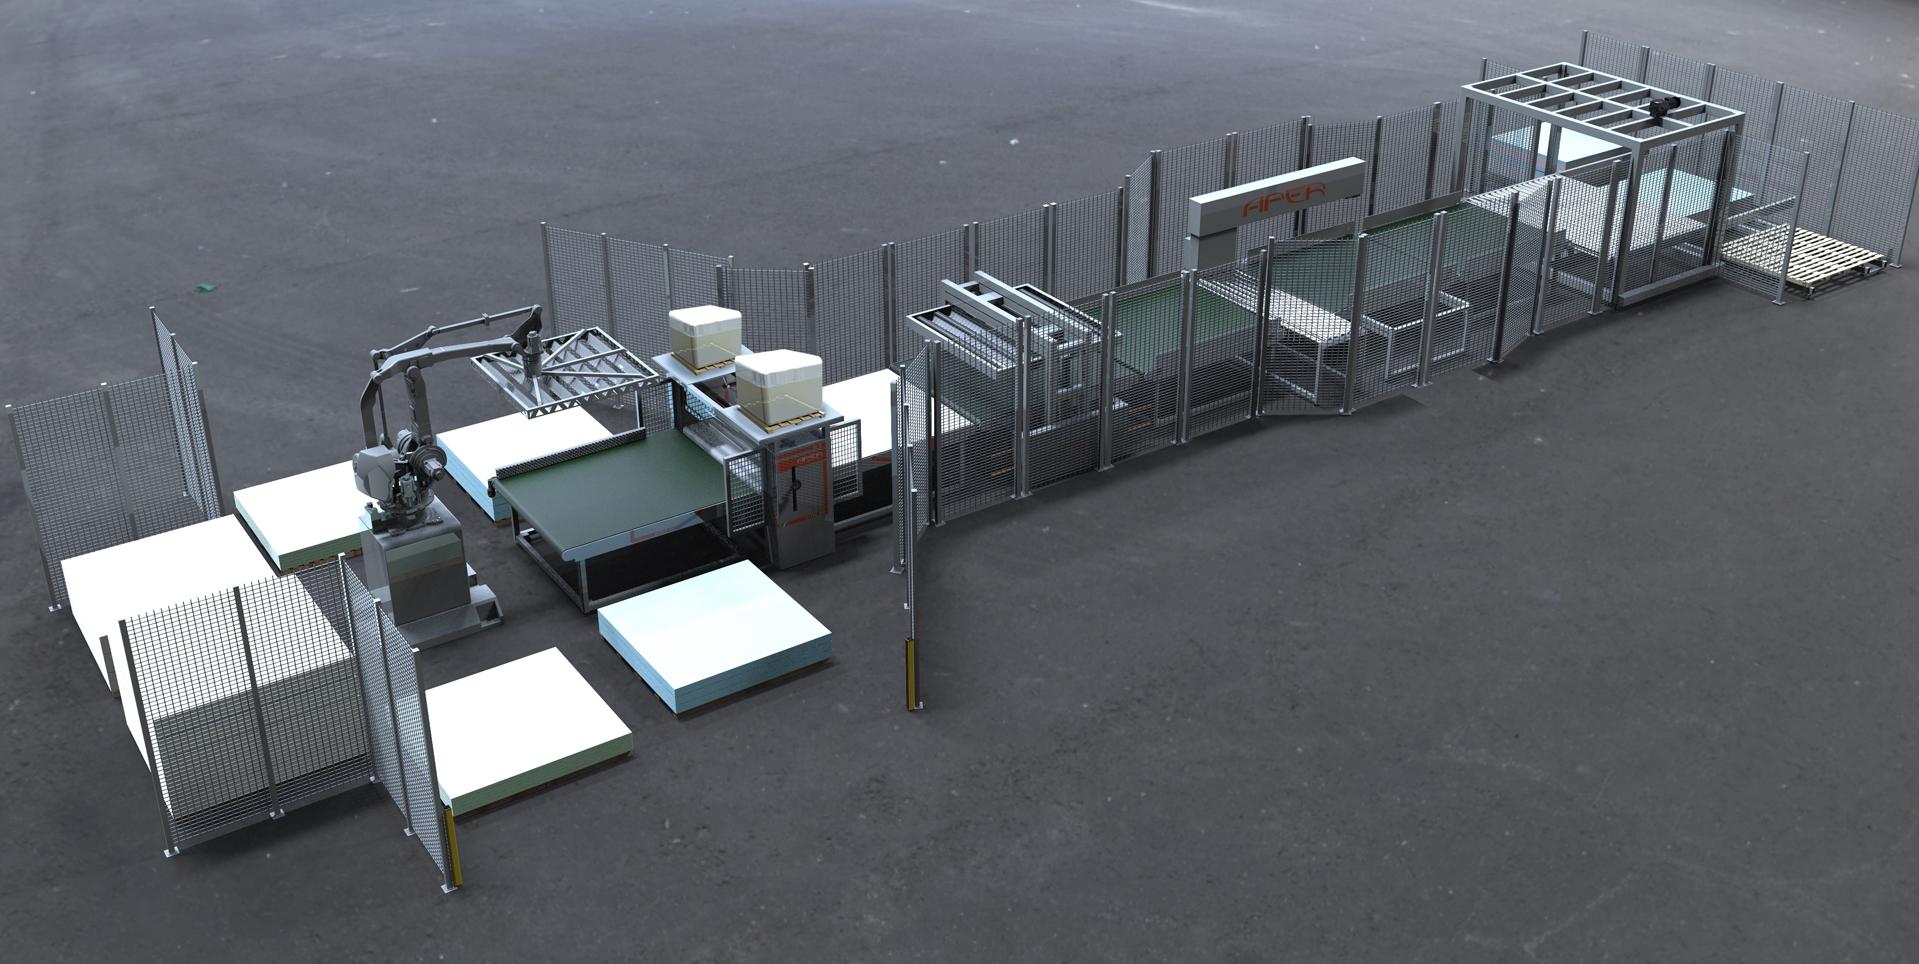 Aper production lines